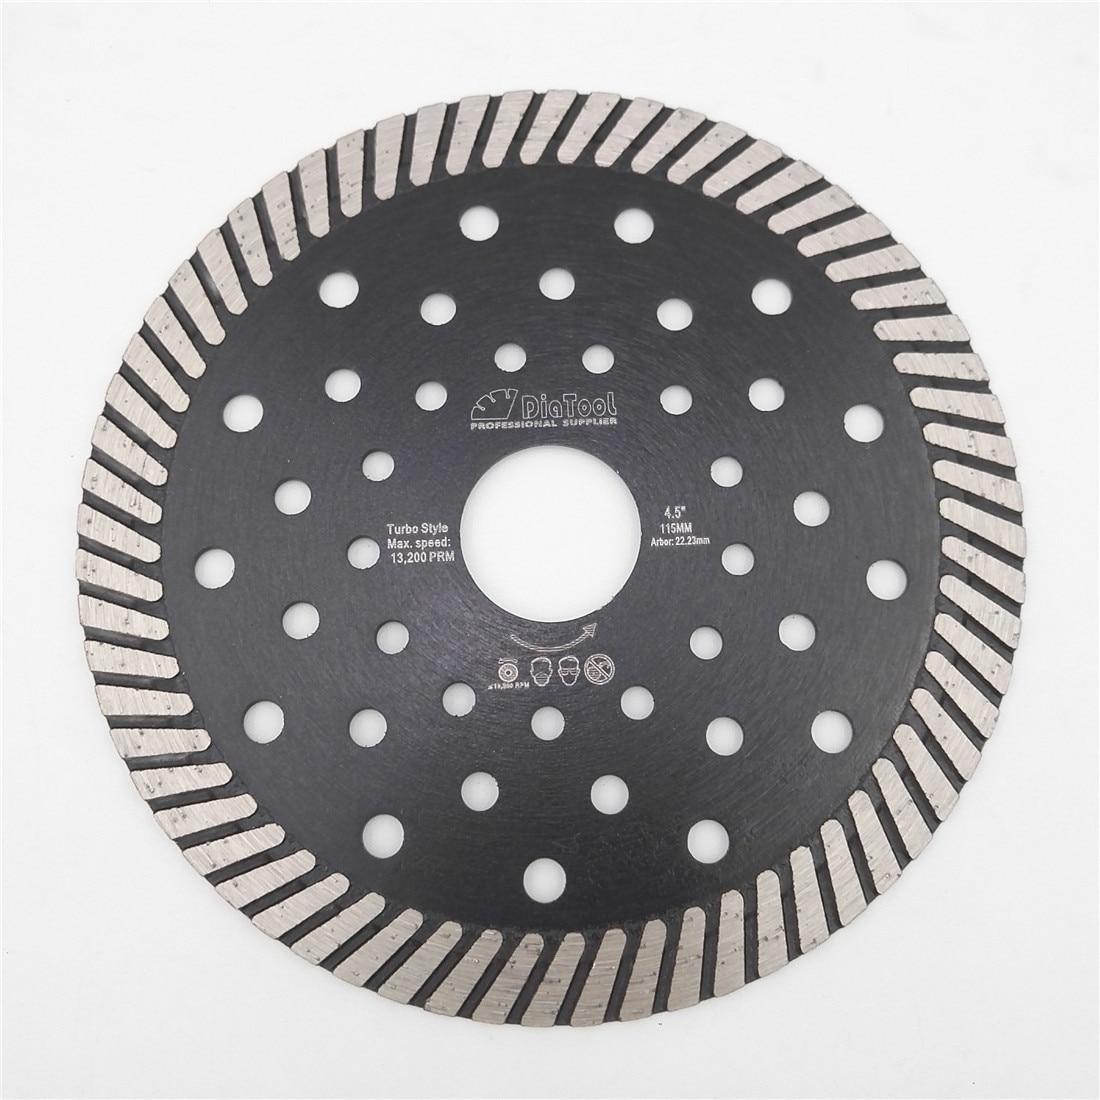 DIATOOL 4.5/5/7/9 Diamond Hot Pressed Turbo Blade Cutting Disc Granite Marble Concrete Masonry Sawblade Diamond Wheel Disc